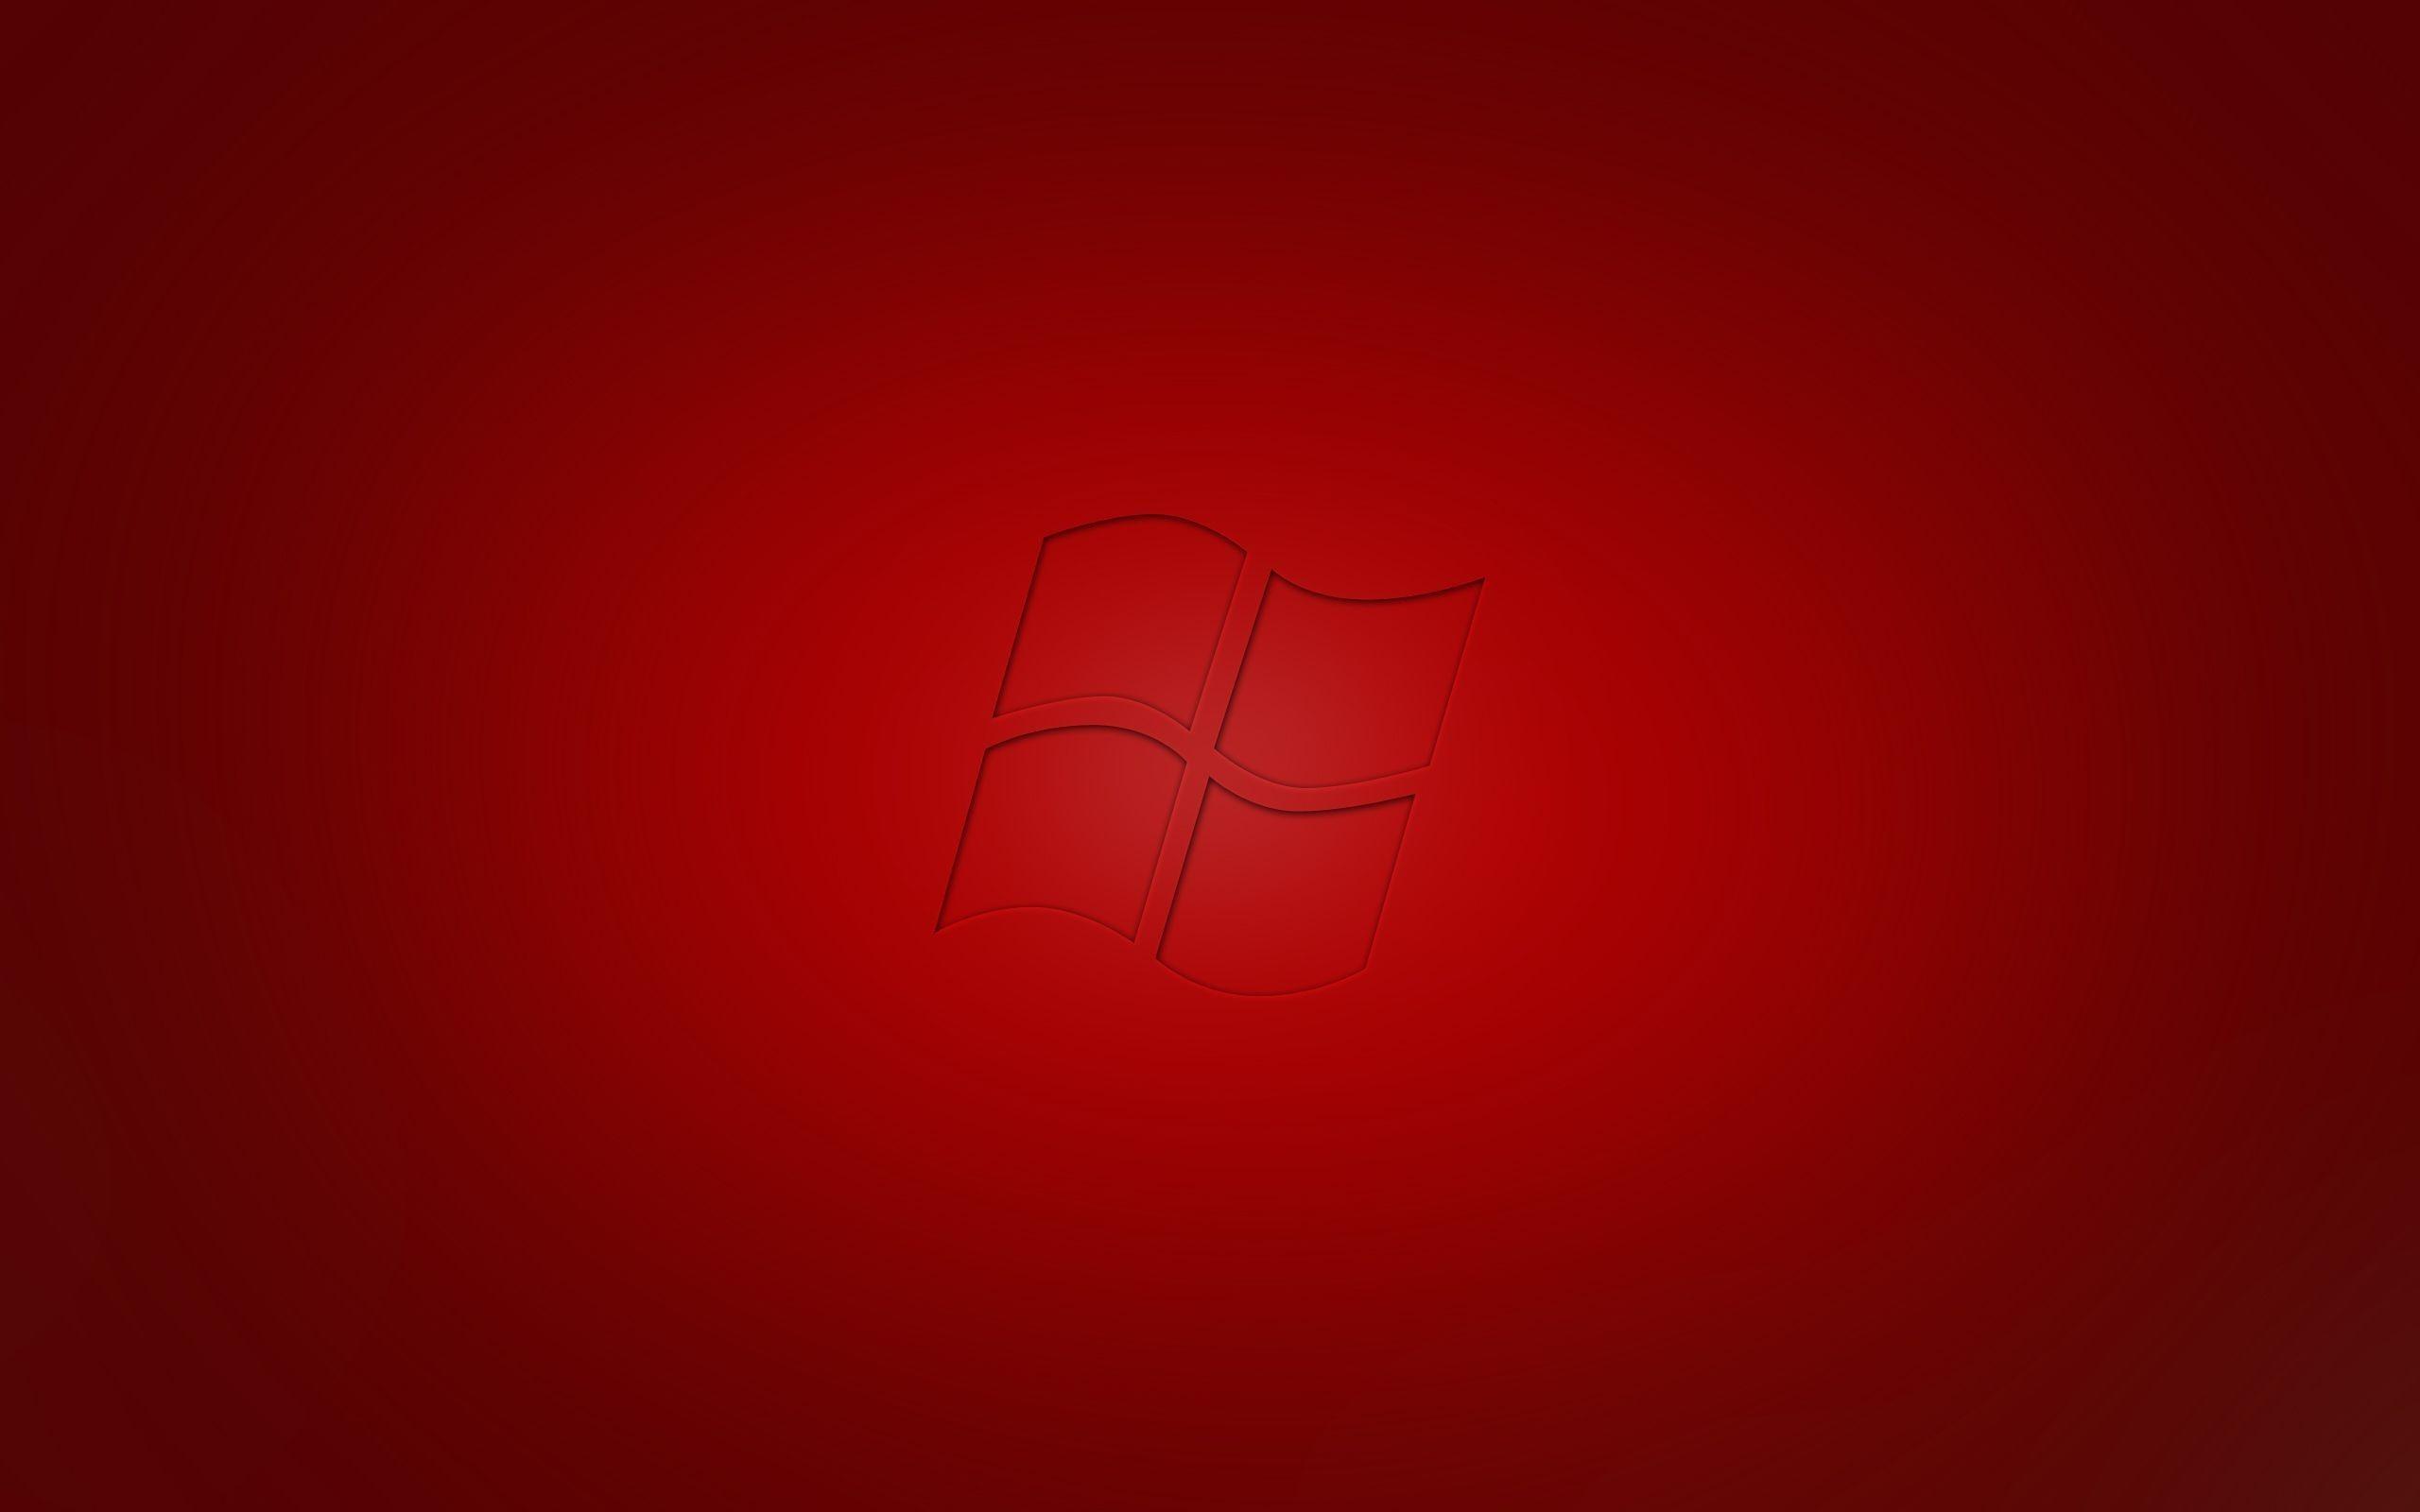 PreviousNext. Previous Image Next Image. red windows 10 wallpaper …